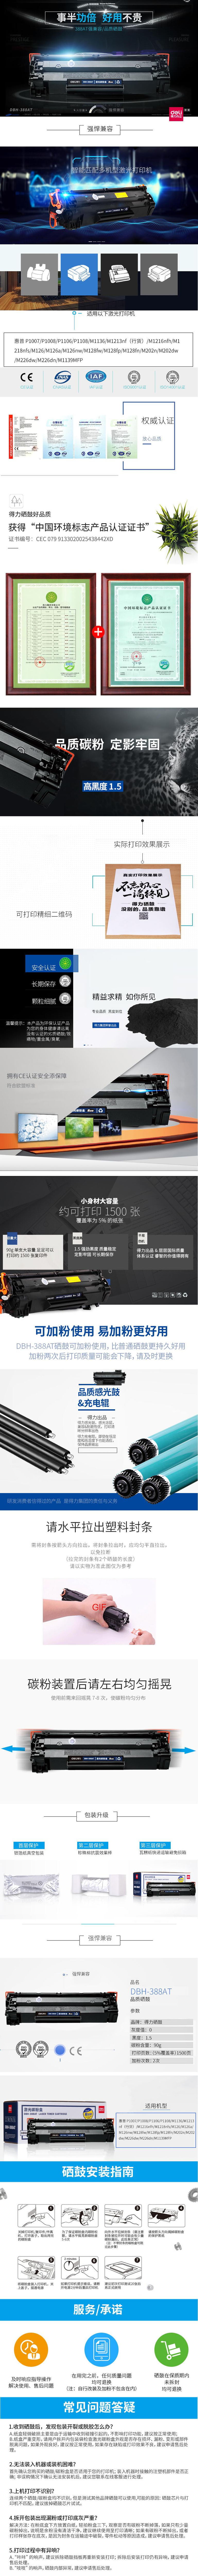 VWIN真人DBH-388AT激光碳粉盒(黑色)